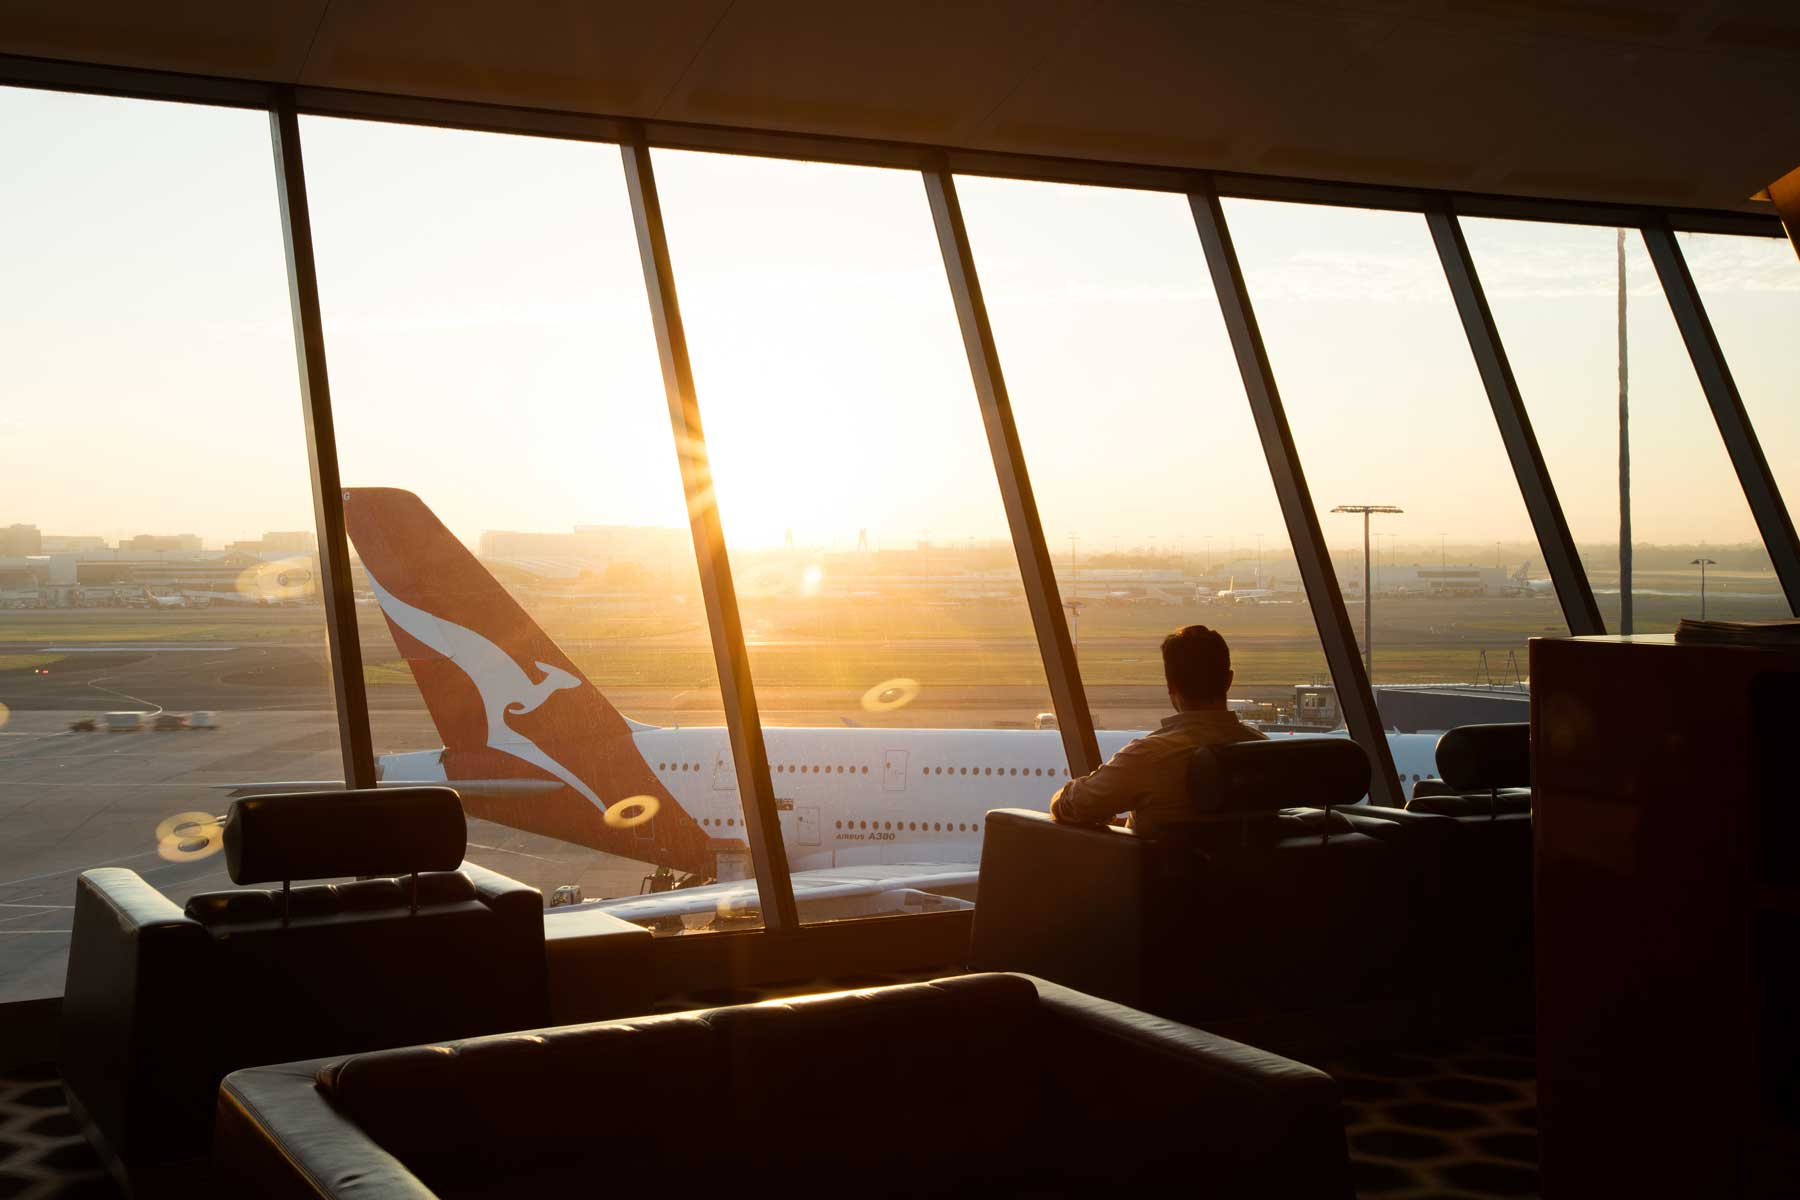 Aerostorie-Sydney-Basics-Airport-(Credit-Qantas).jpg